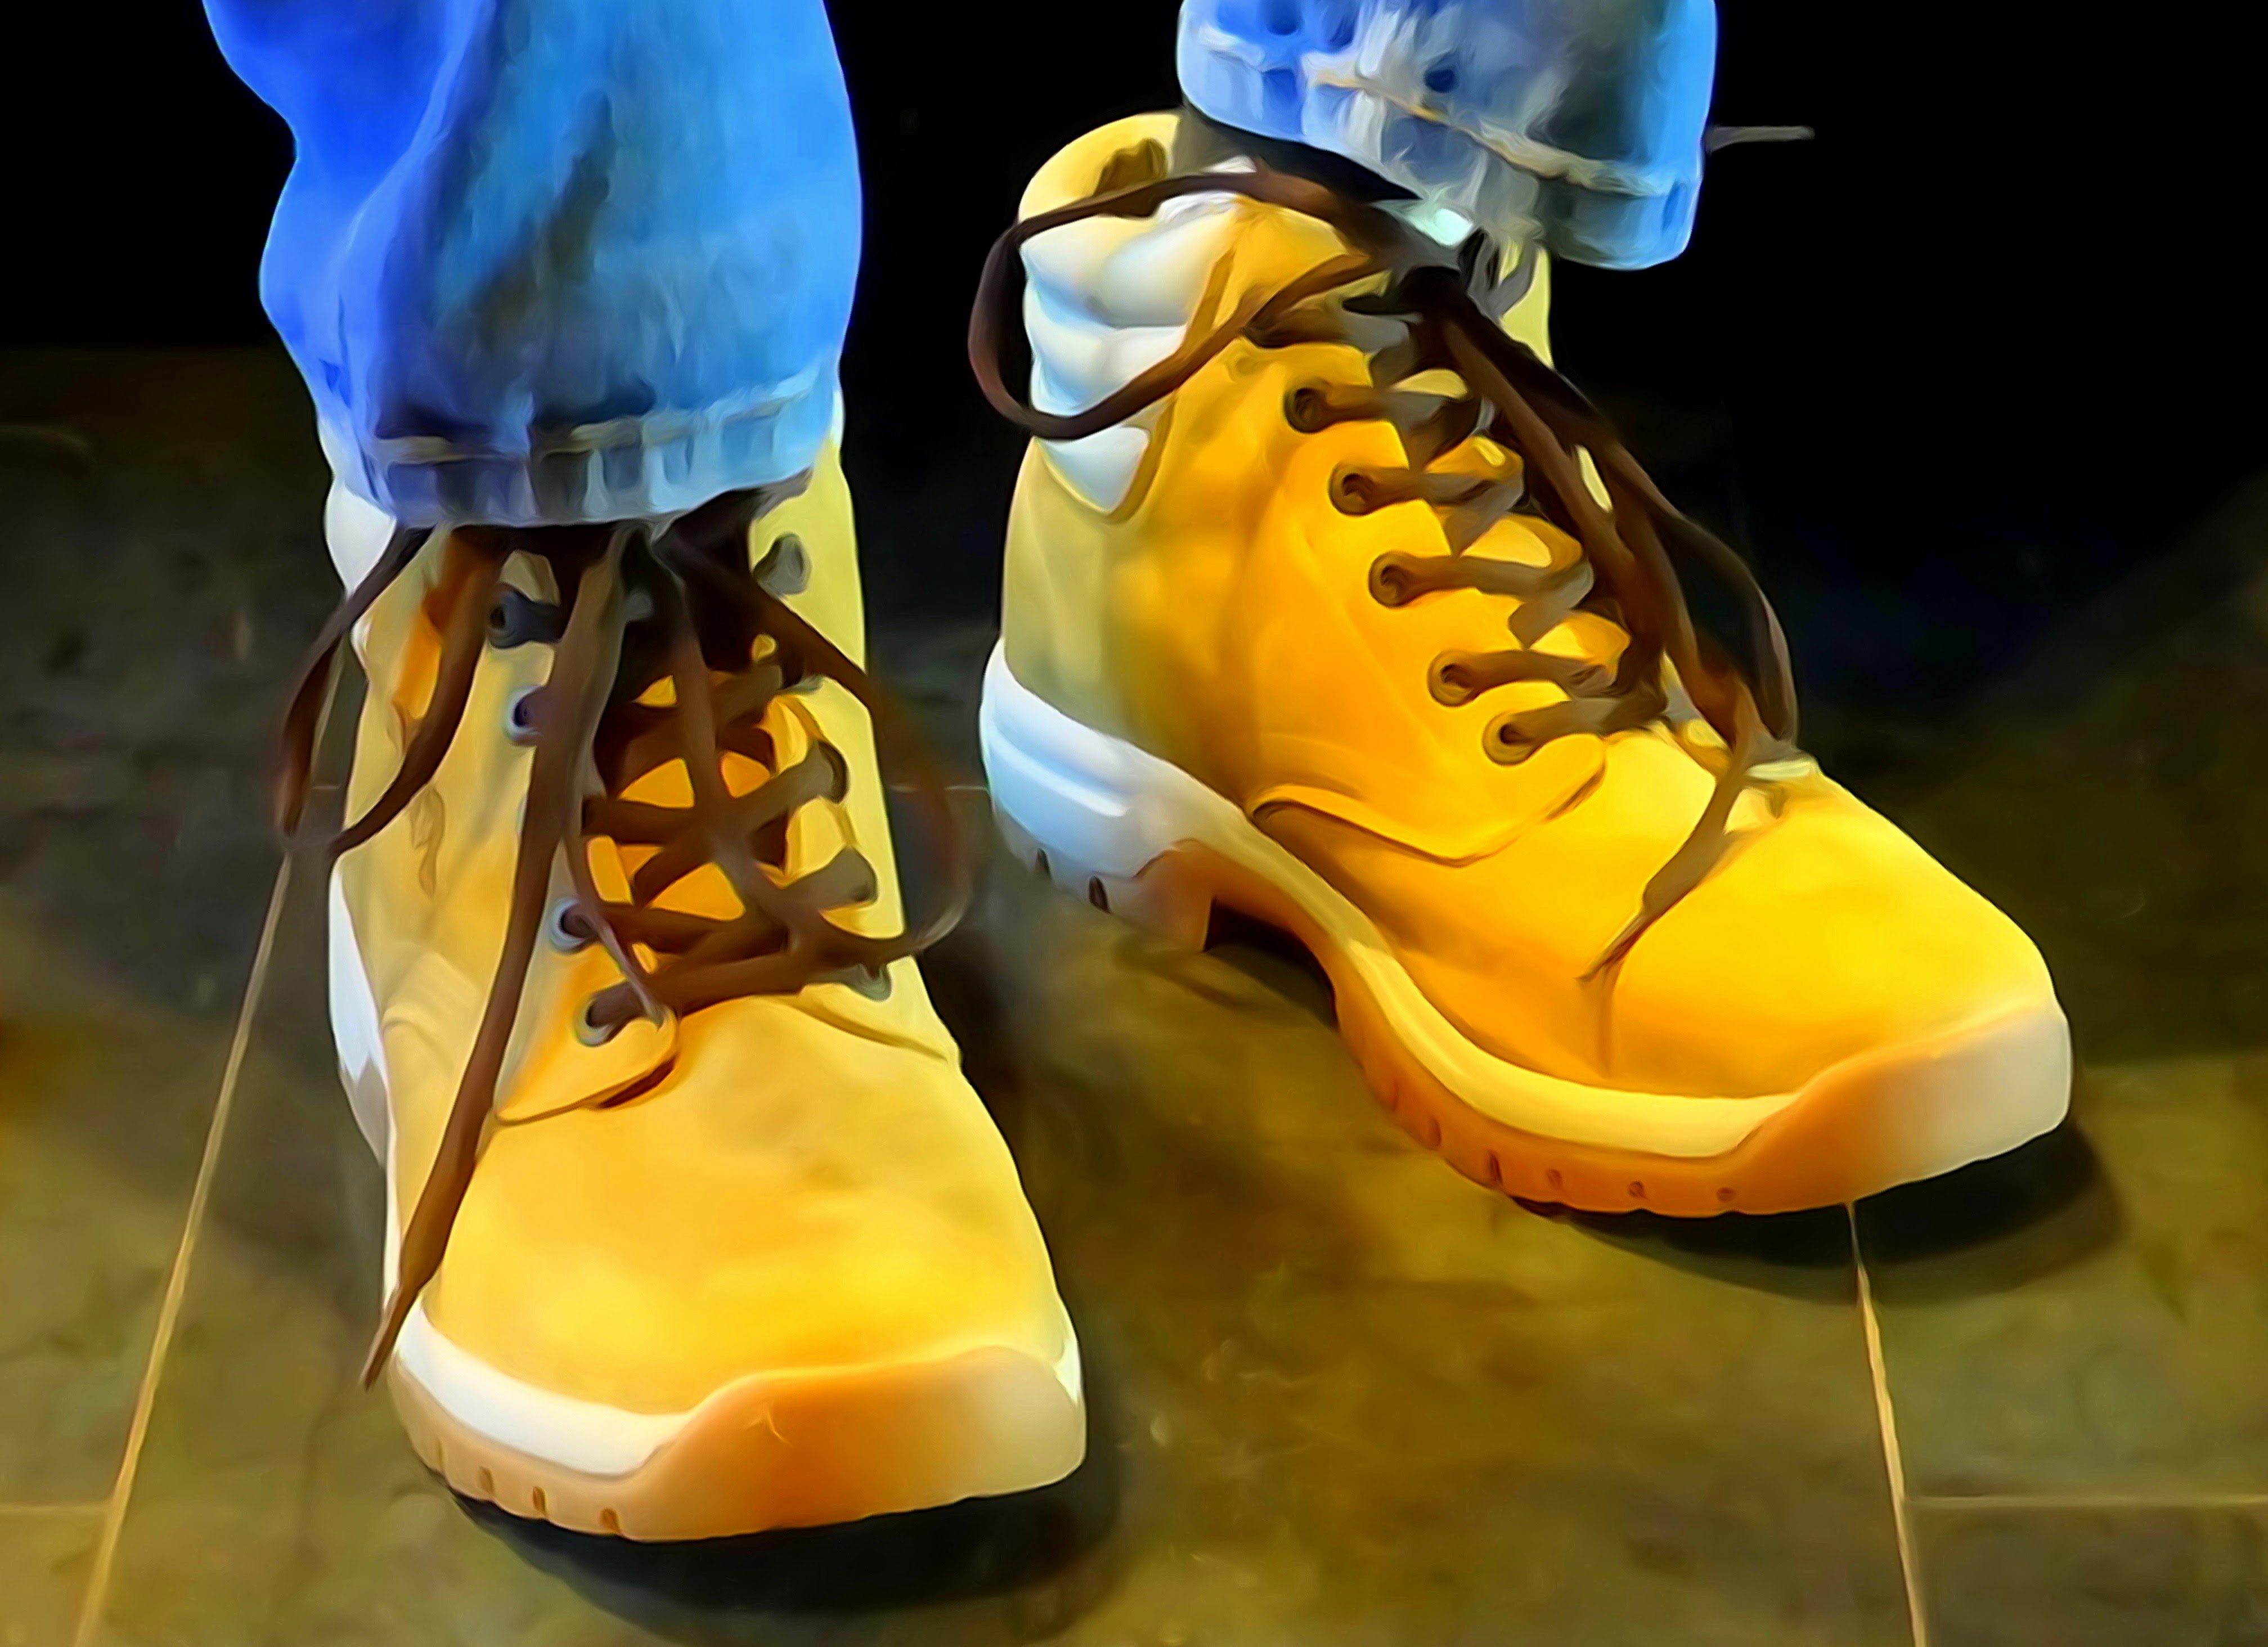 File:Boots are made for walking Flickr Stiller